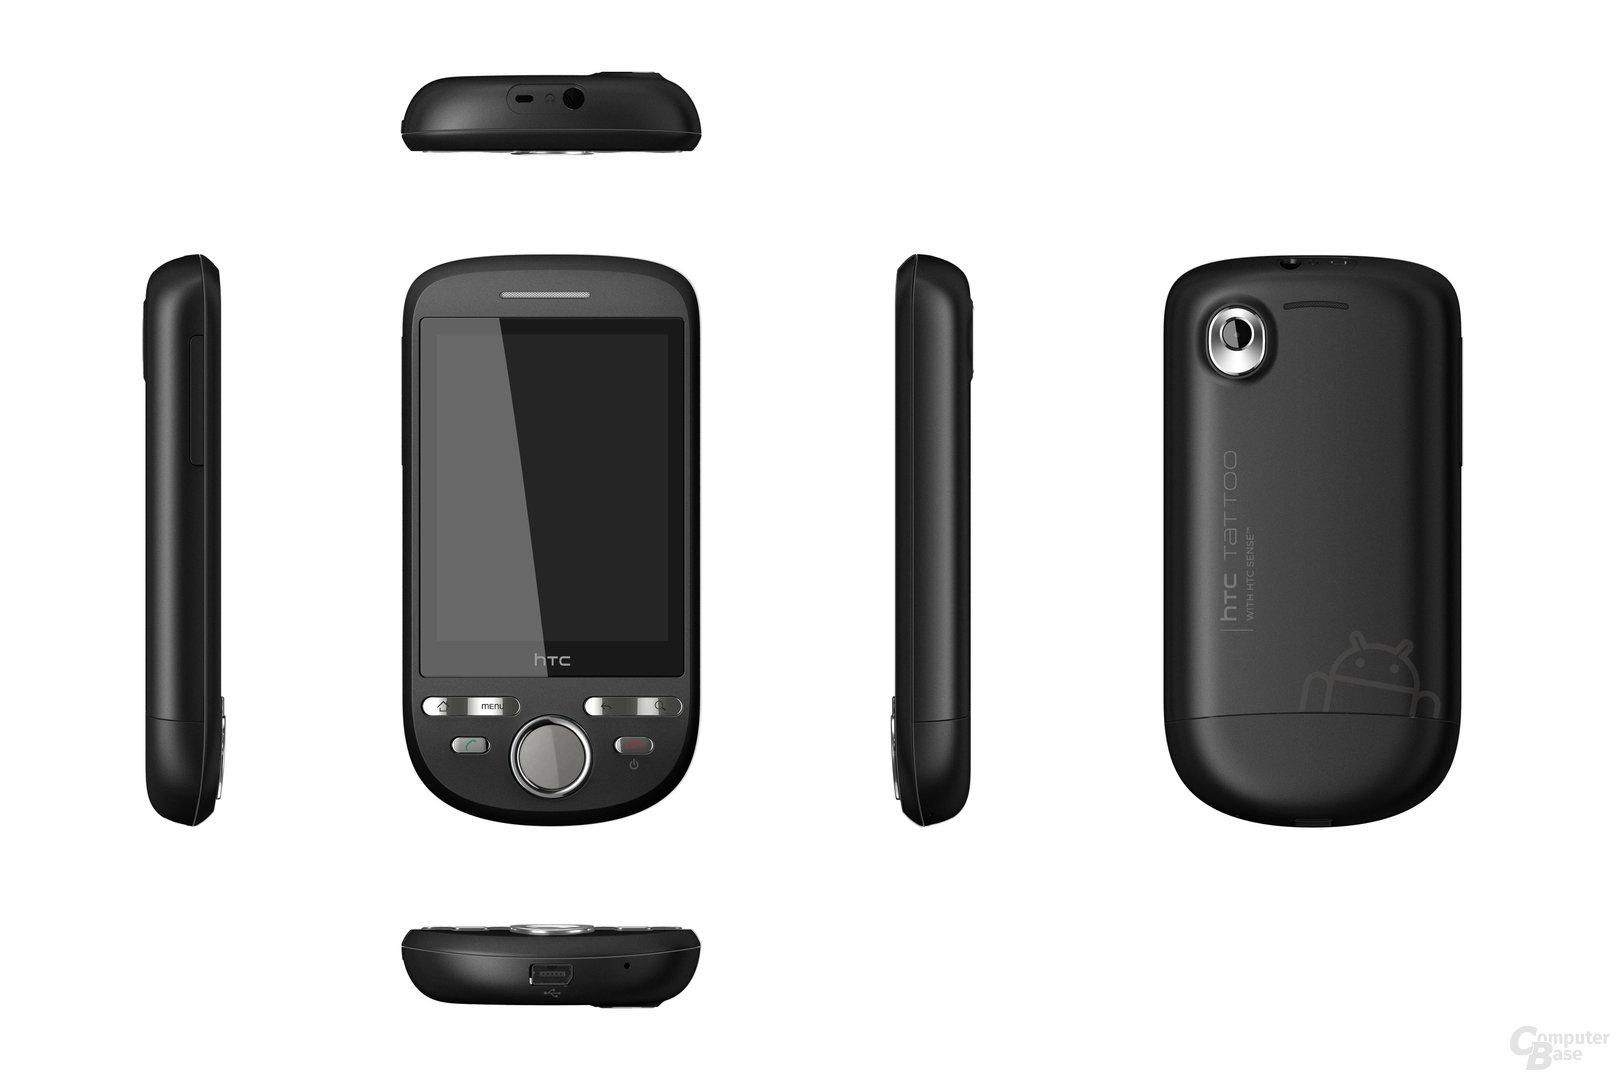 HTC Tattoo SophisticatedBlack